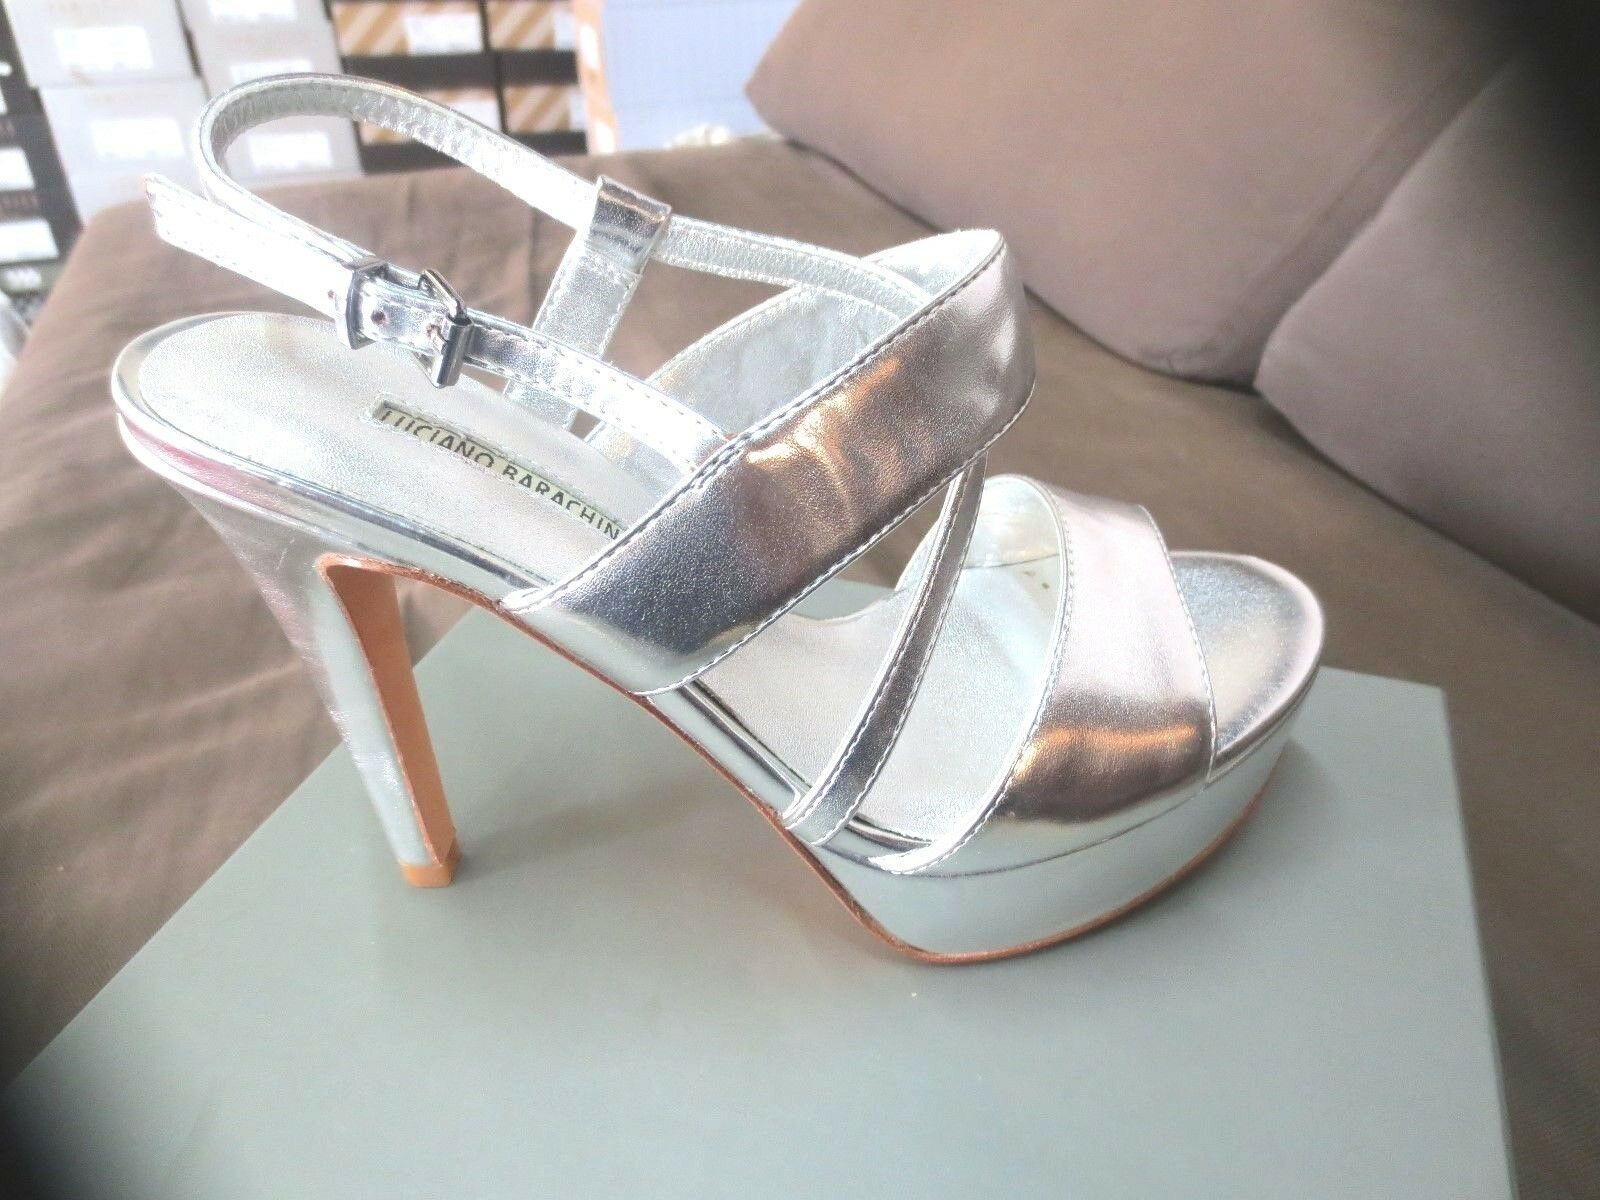 Barachini silver leather sandal new 129a value size 36, 37,38, 39,40.